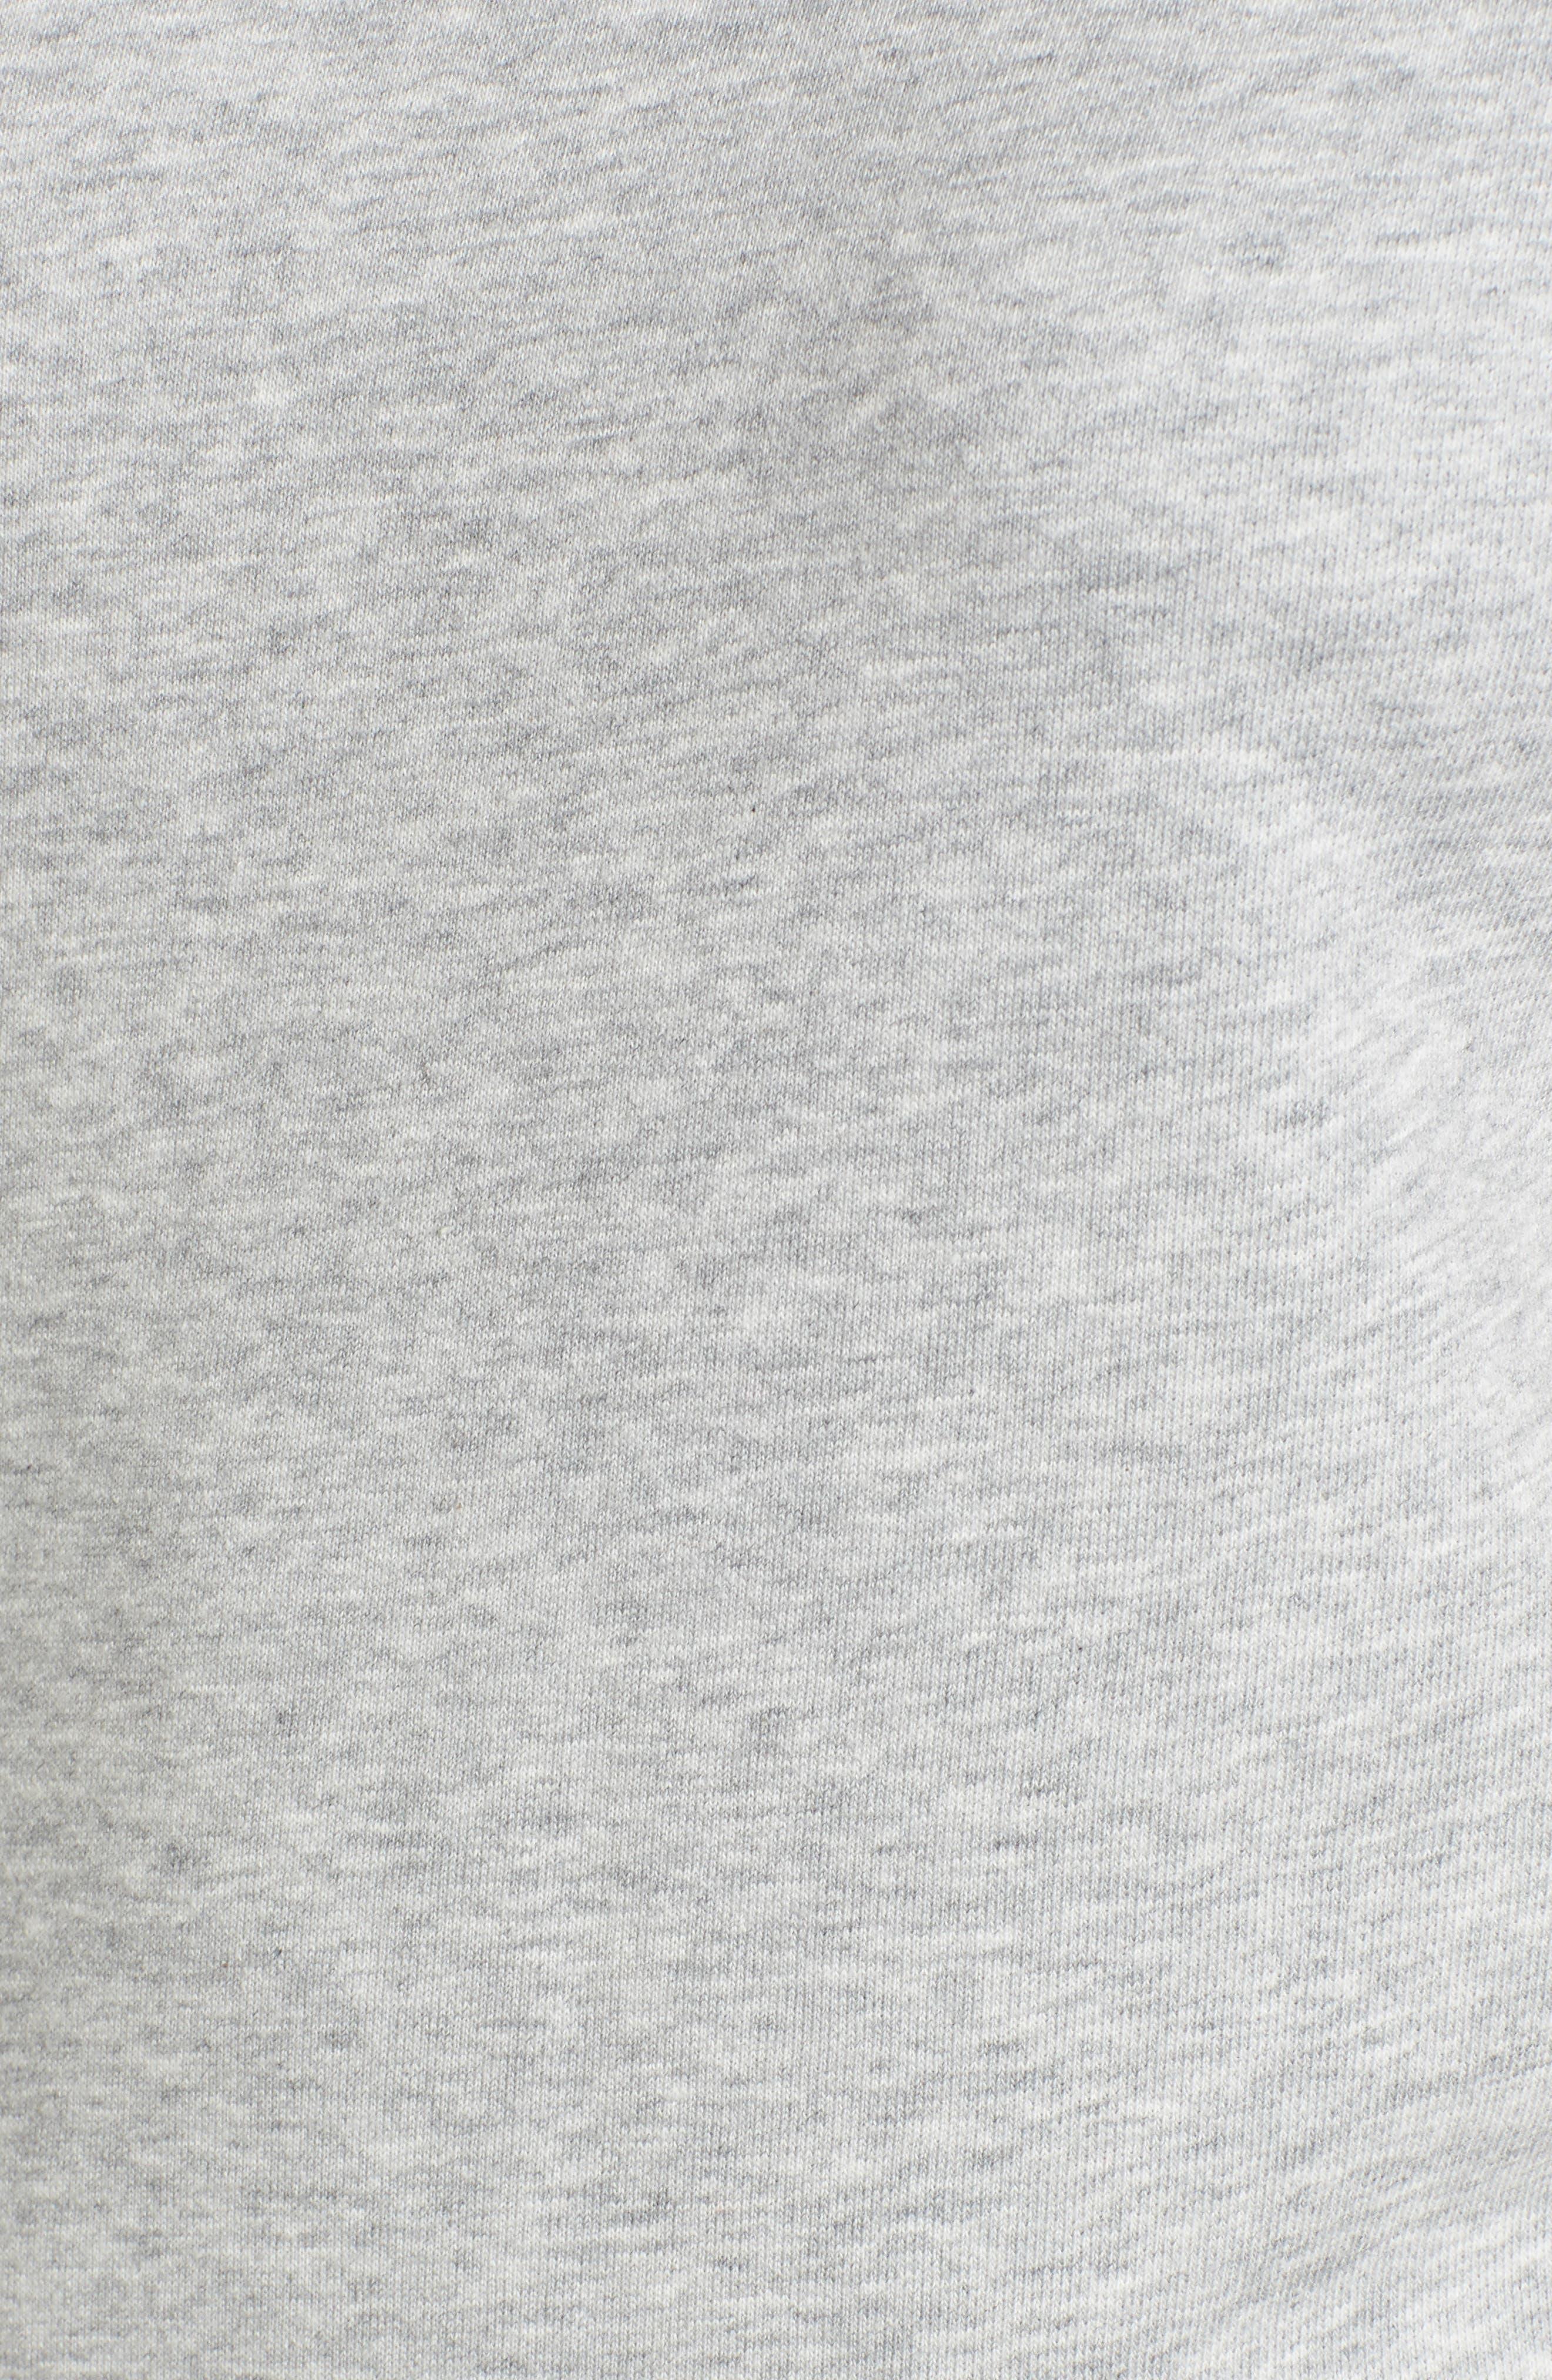 Bow Sleeve Sweatshirt,                             Alternate thumbnail 5, color,                             030